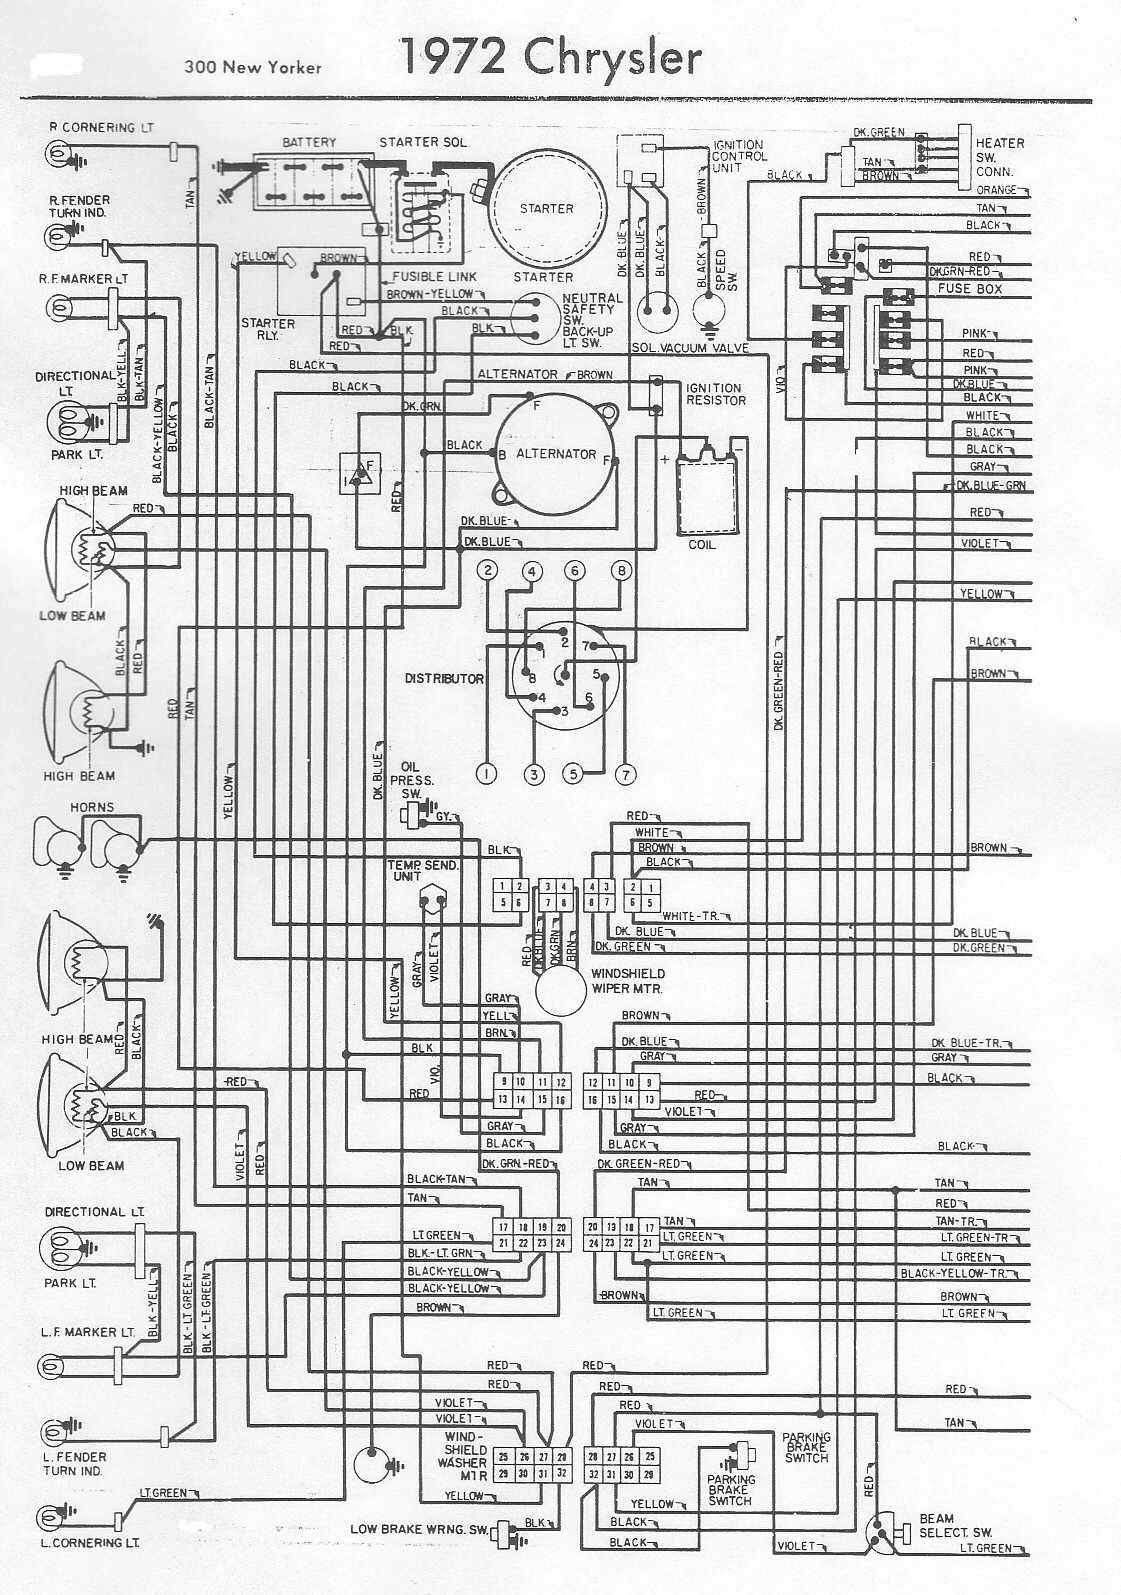 free chrysler wiring diagrams diagram data pre wiring-diagram 1968 chrysler 300 chrysler repair wiring diagram for #2